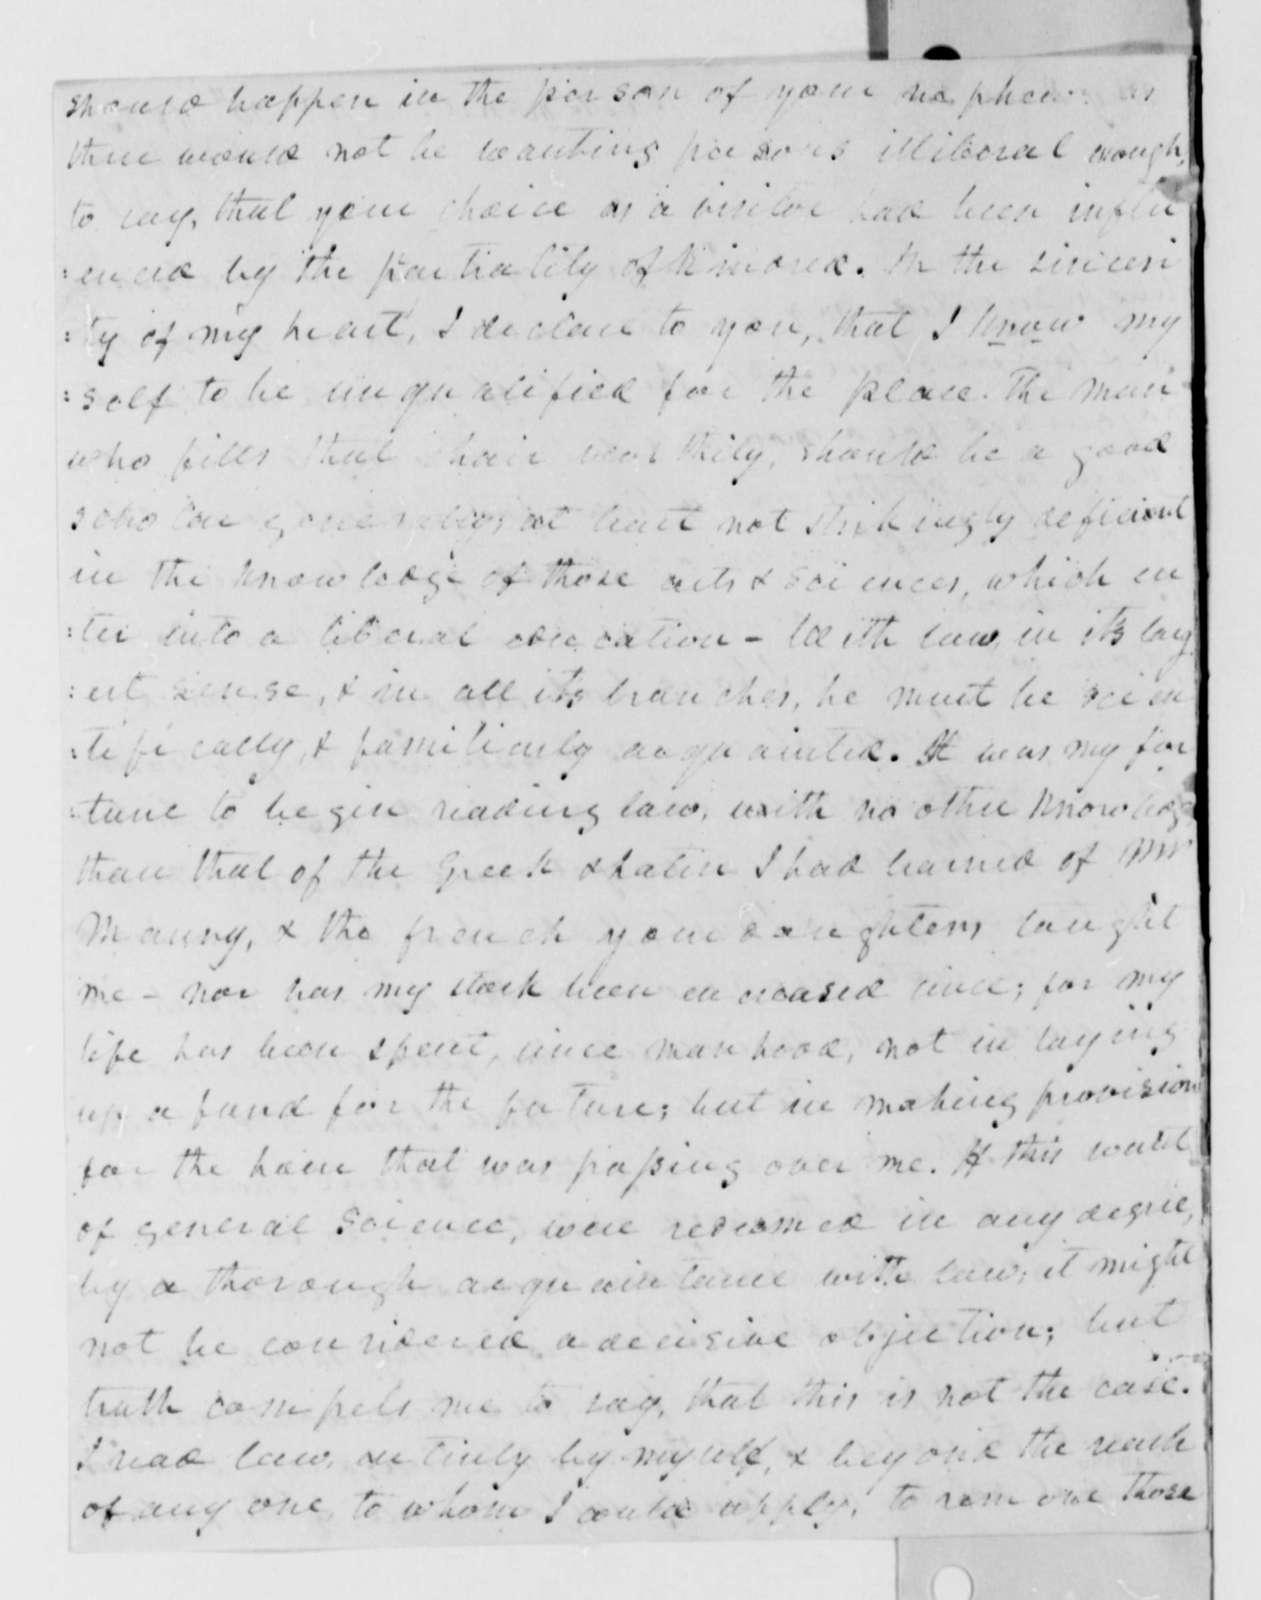 Dabney Carr to Thomas Jefferson, April 30, 1825